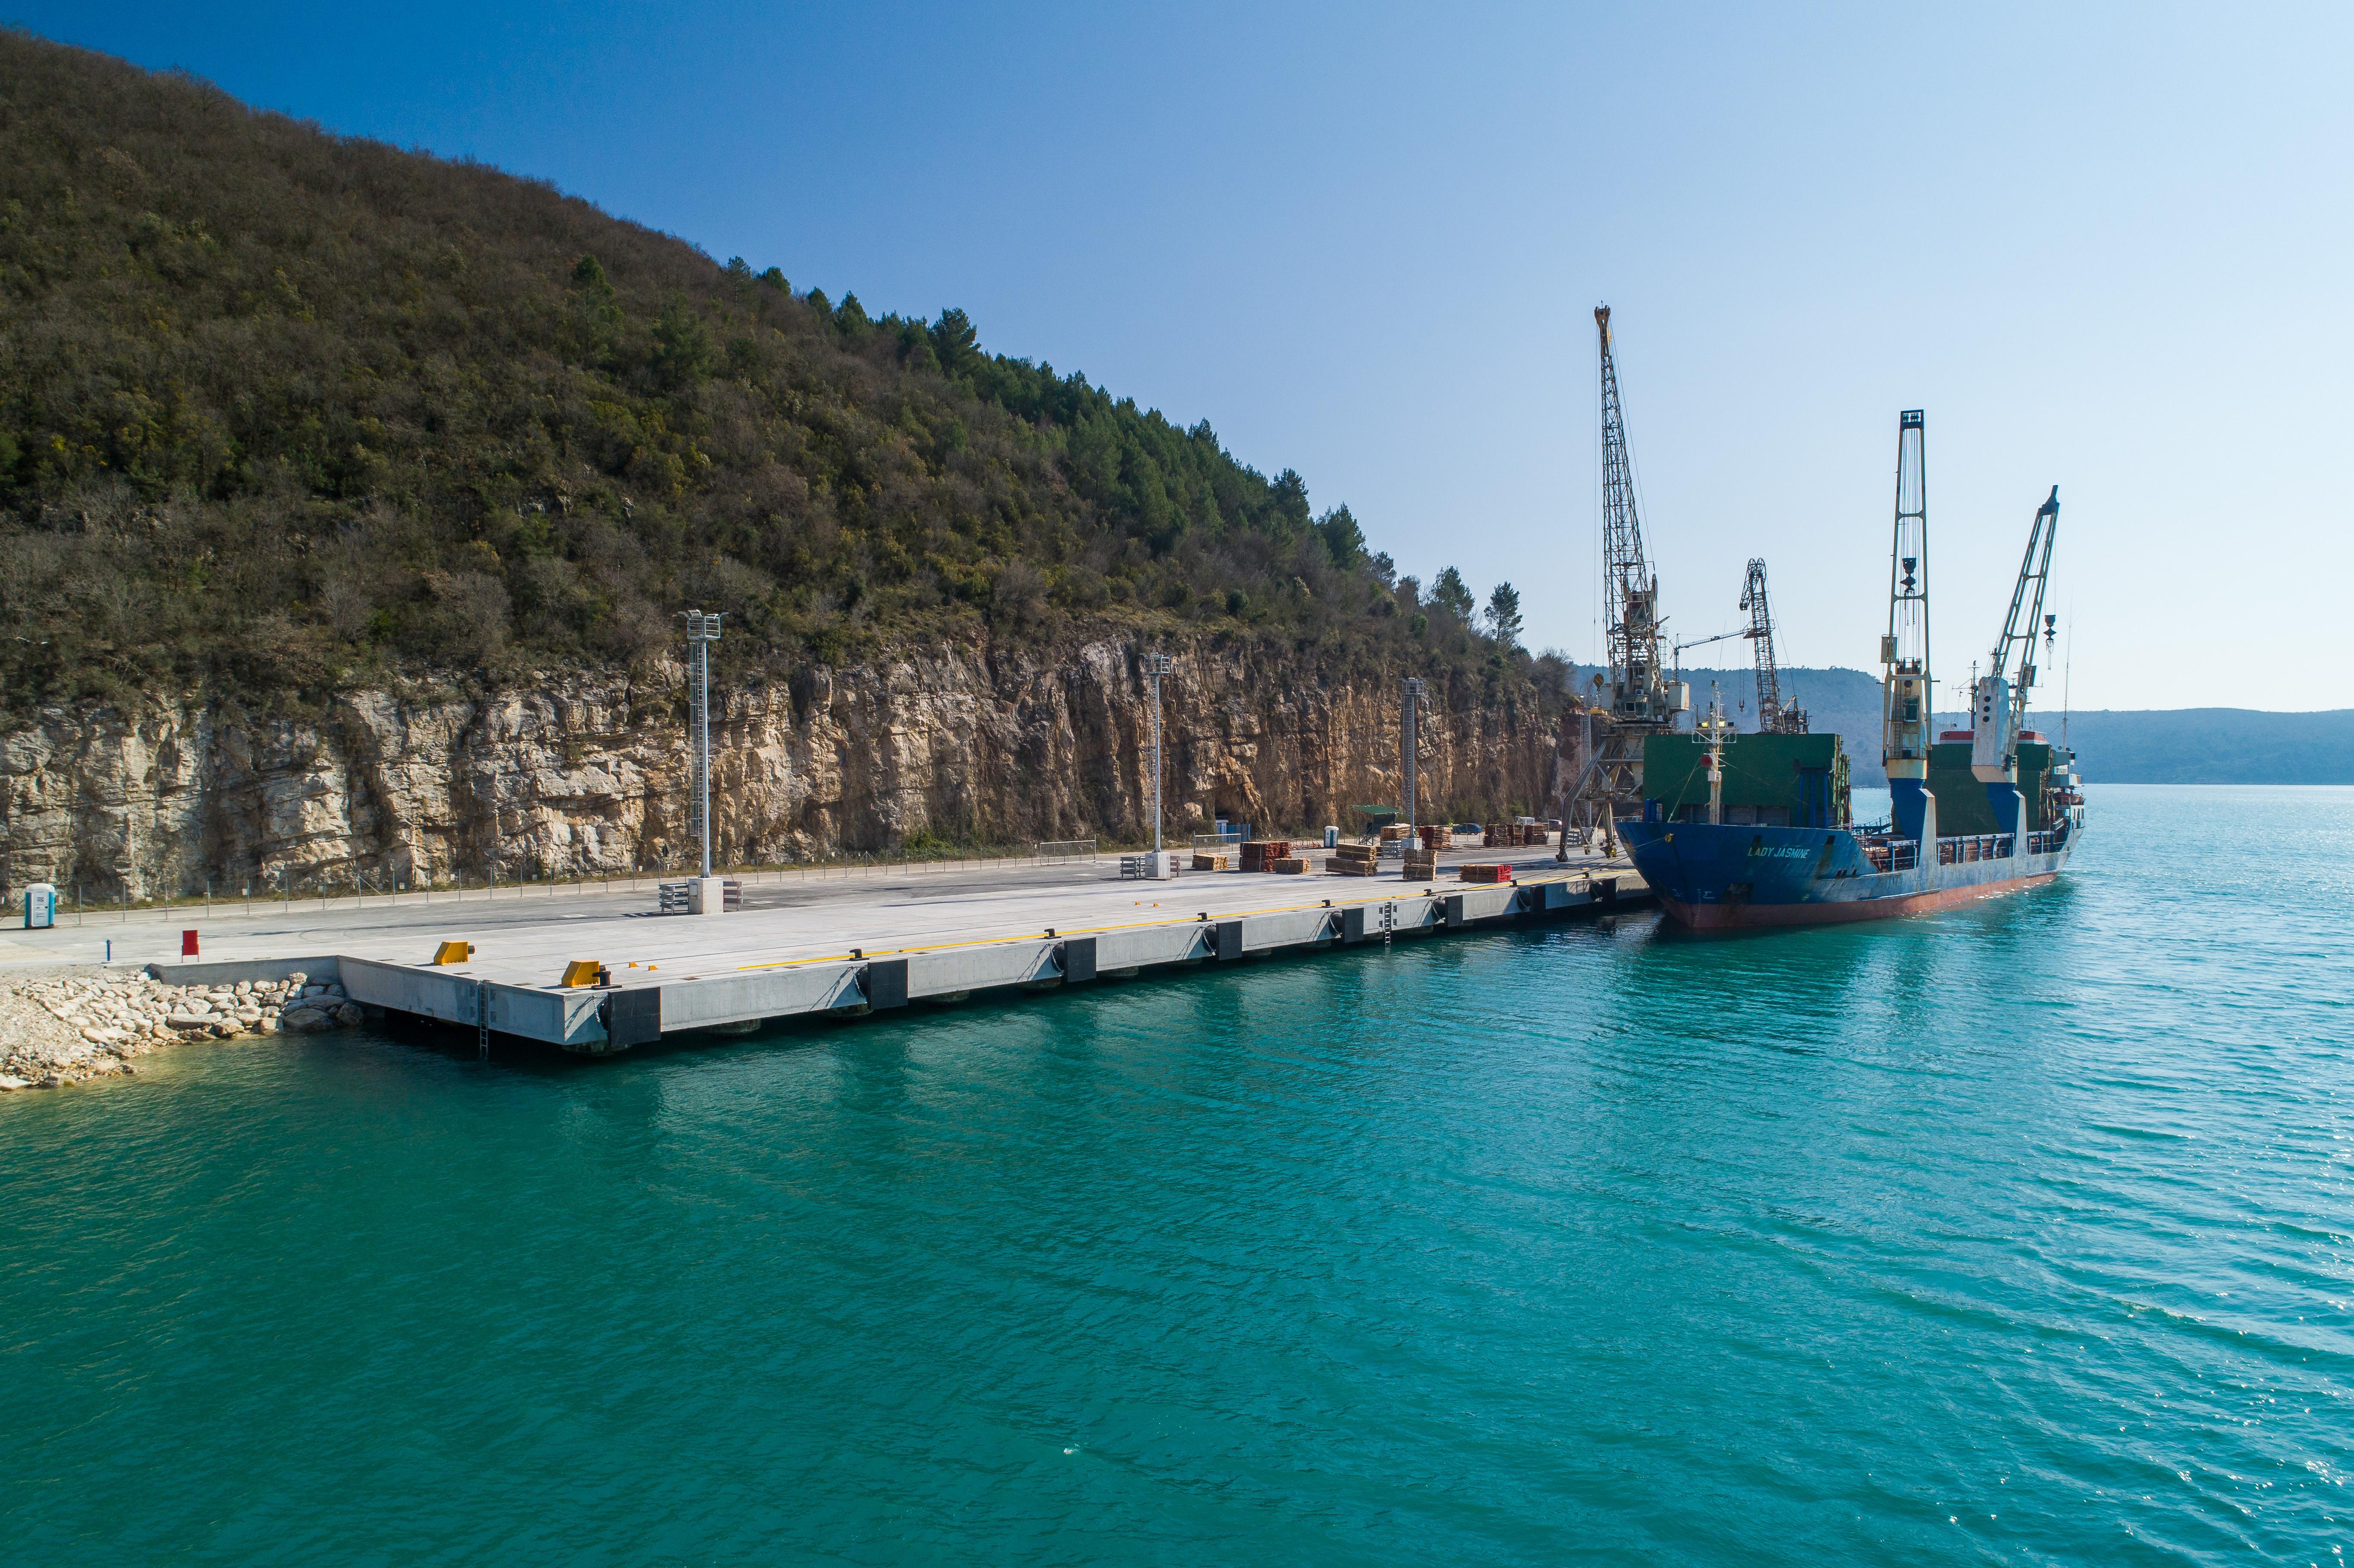 Upgrade of the Rijeka port infrastructure – Terminal for General Cargo (POR2CORE-GCT)